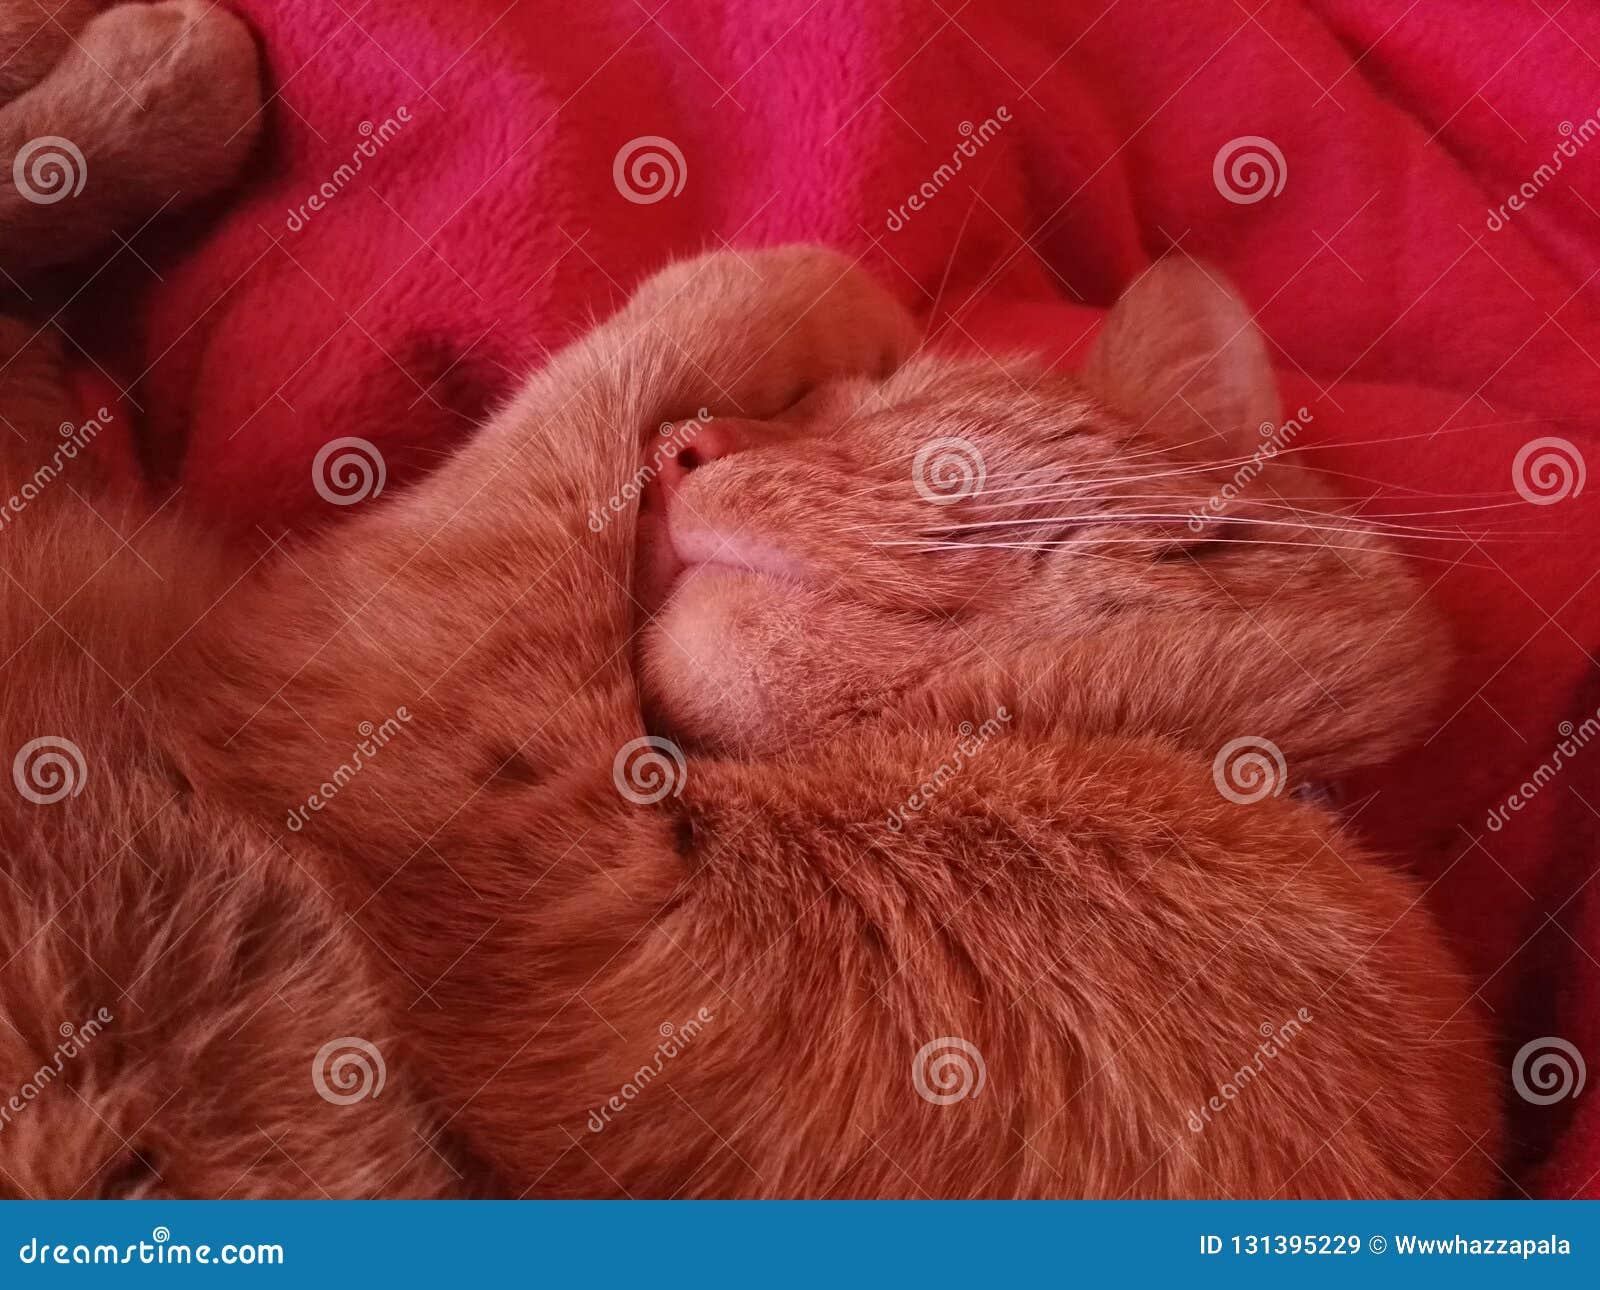 Кот спать на розовой кровати